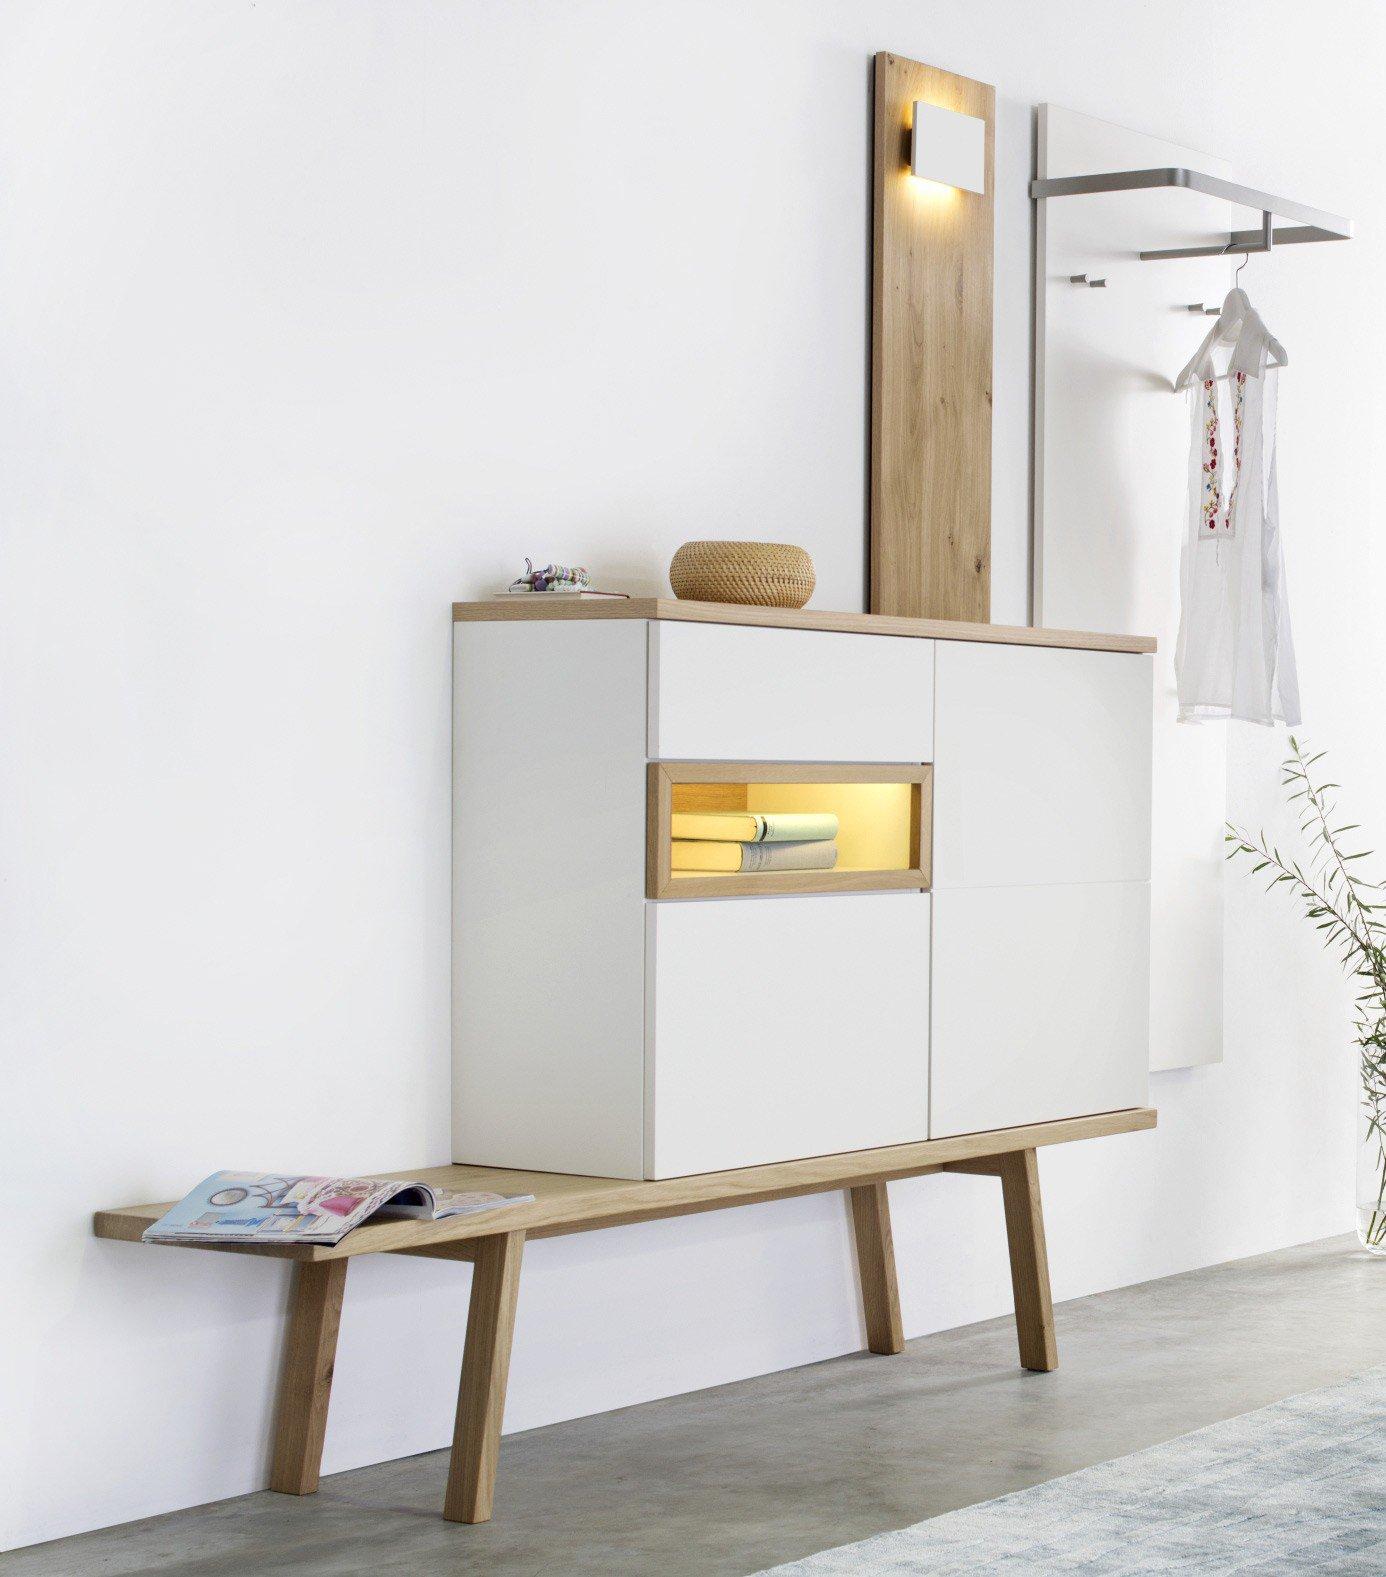 sudbrock garderobe fox 04 m bel letz ihr online shop. Black Bedroom Furniture Sets. Home Design Ideas